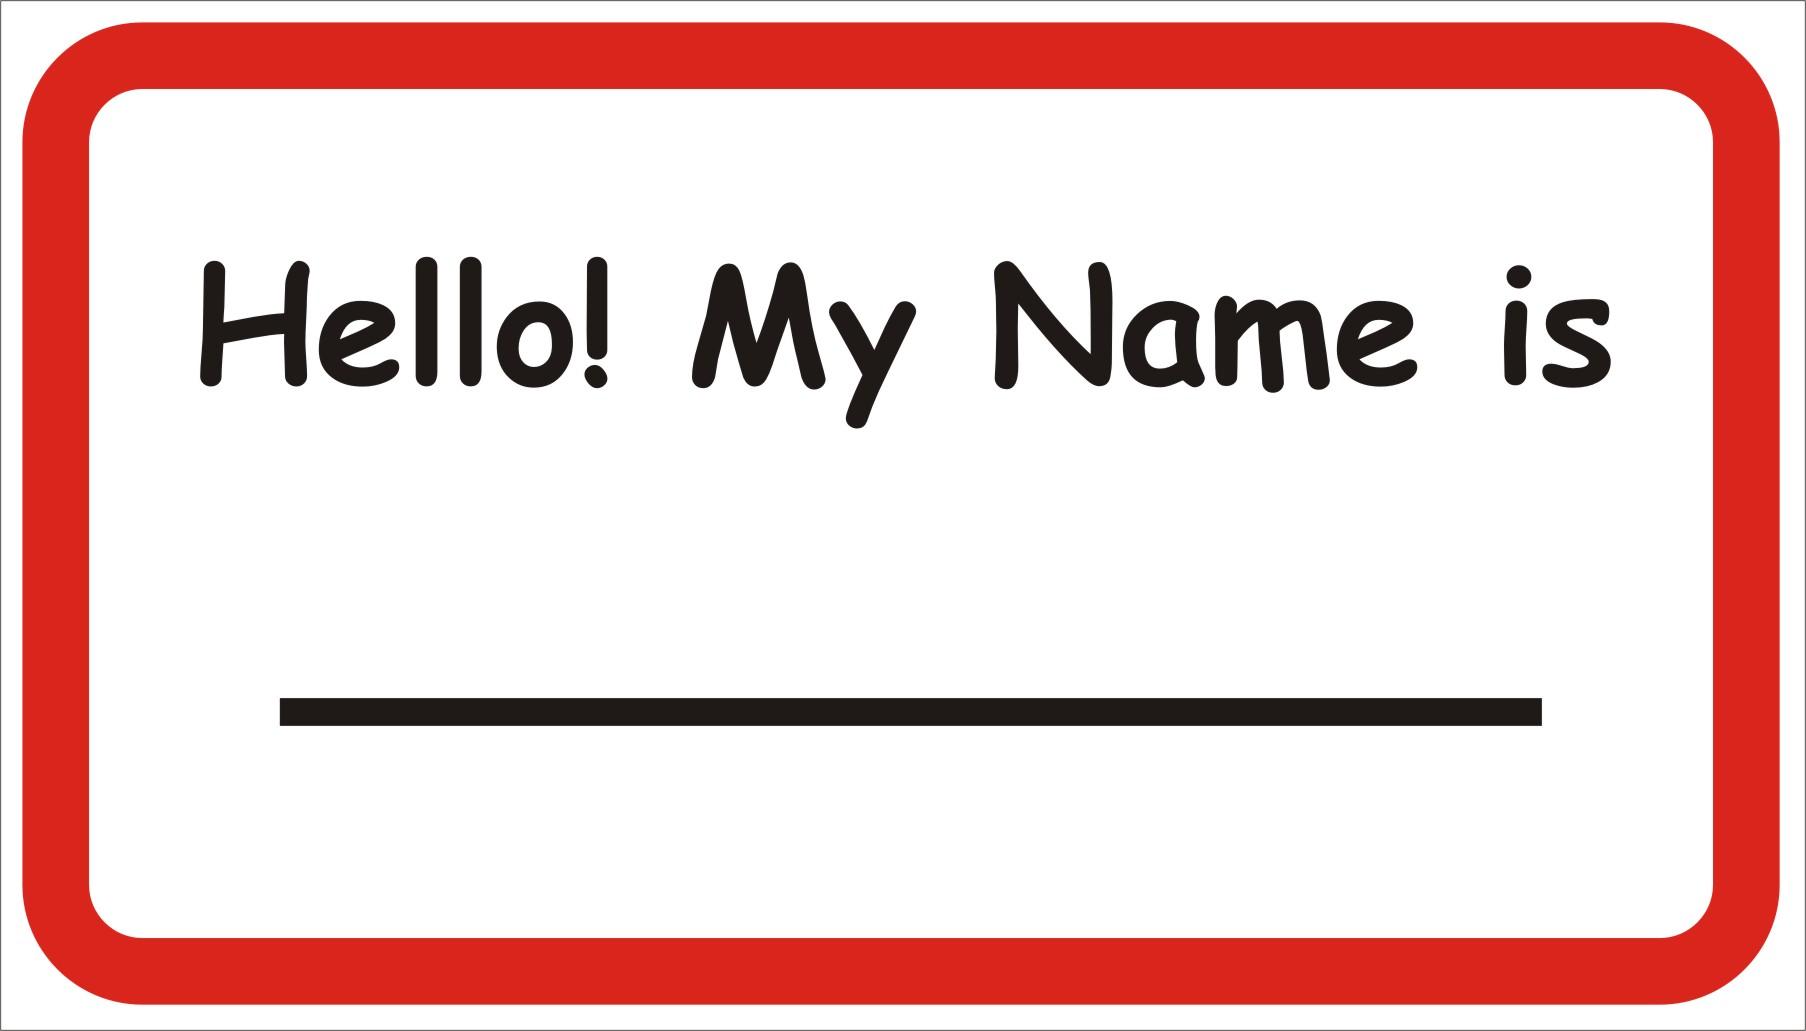 printable-name-tags-r0zxxuni.jpg